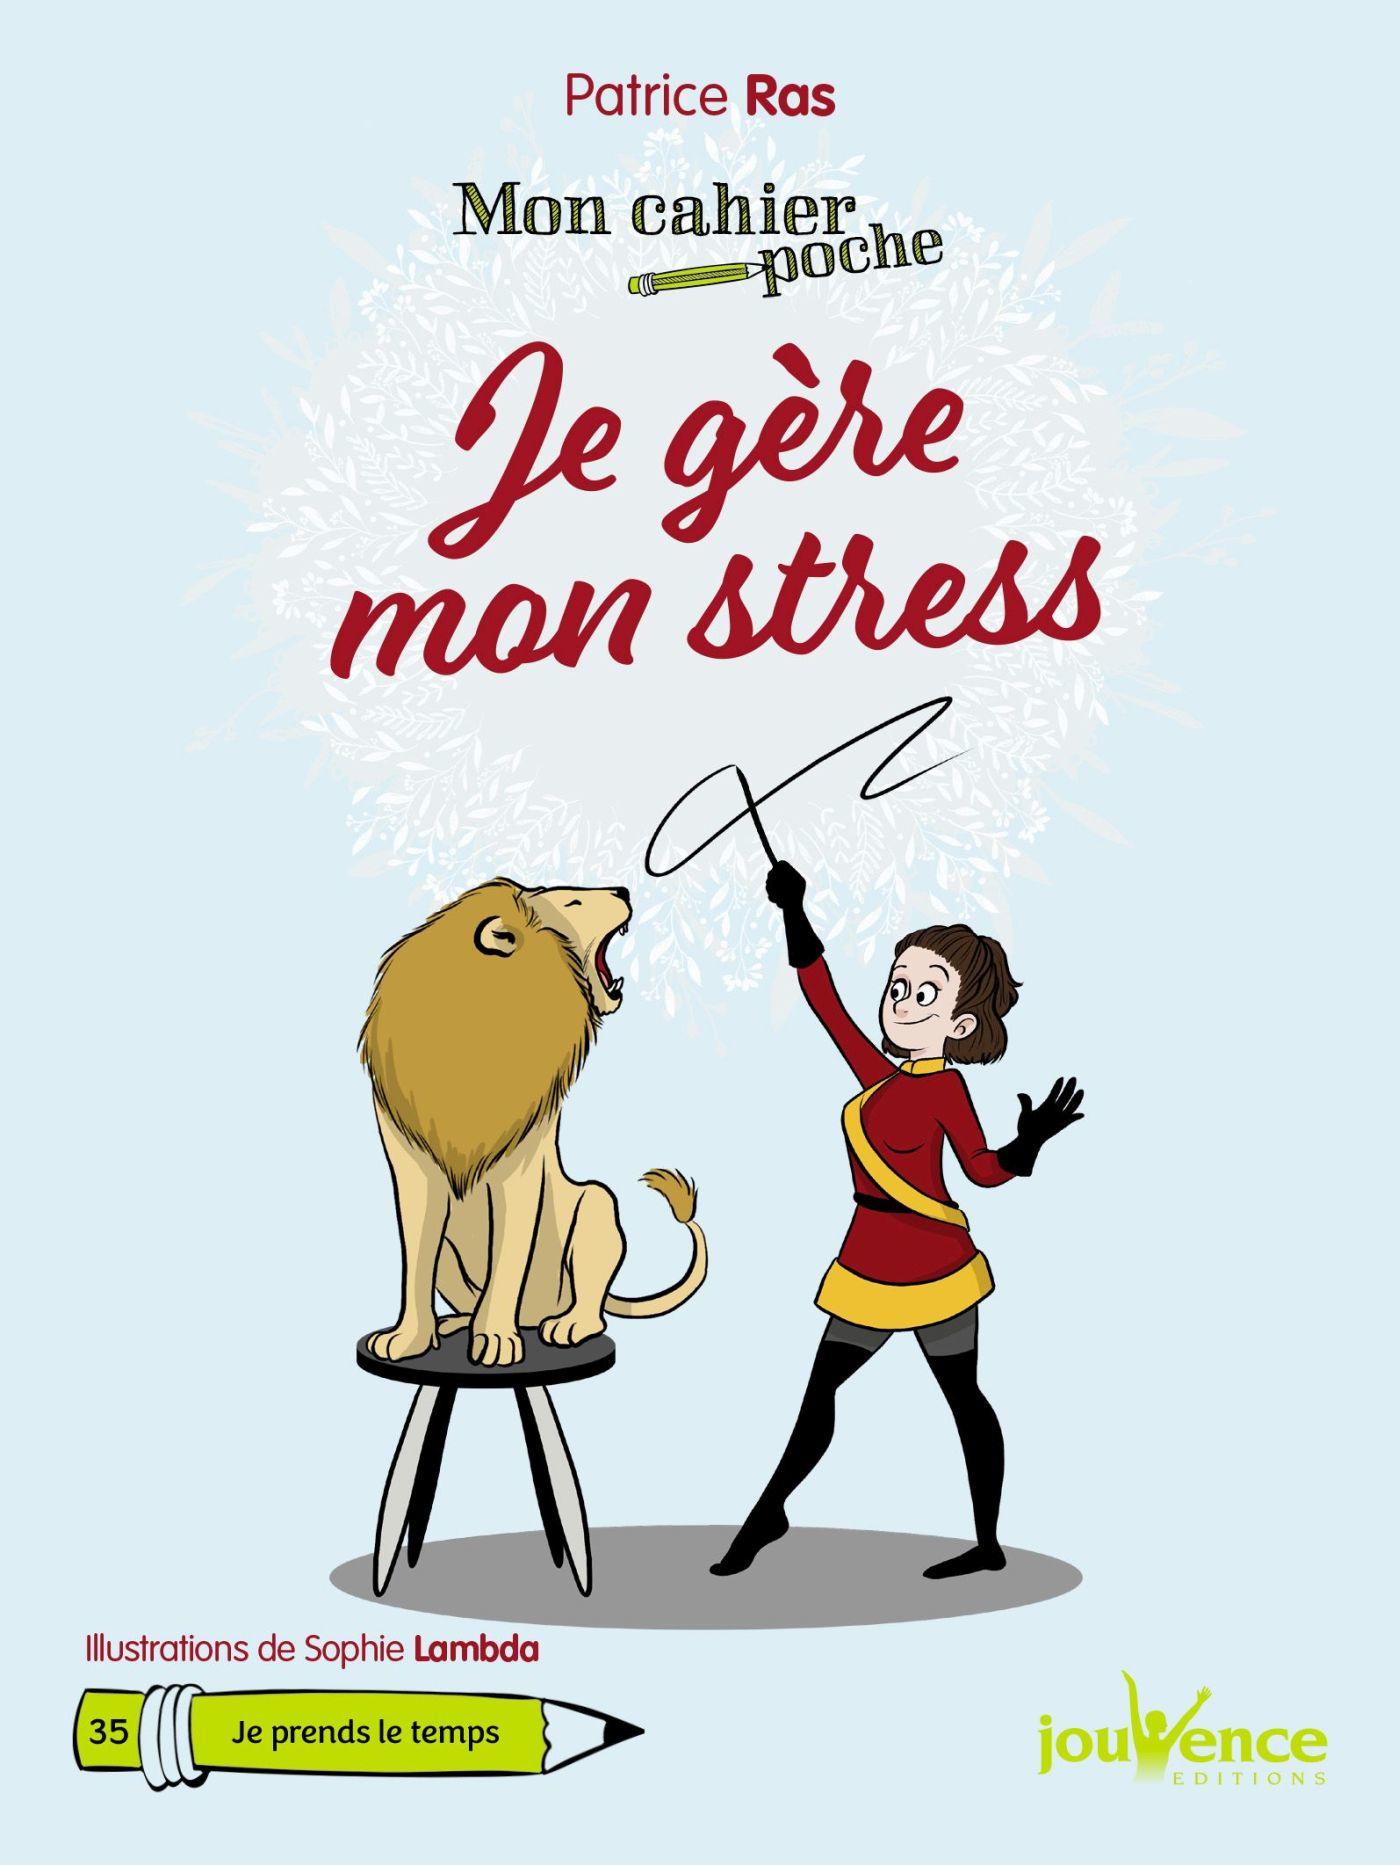 Mon Cahier Poche : Je gère mon stress